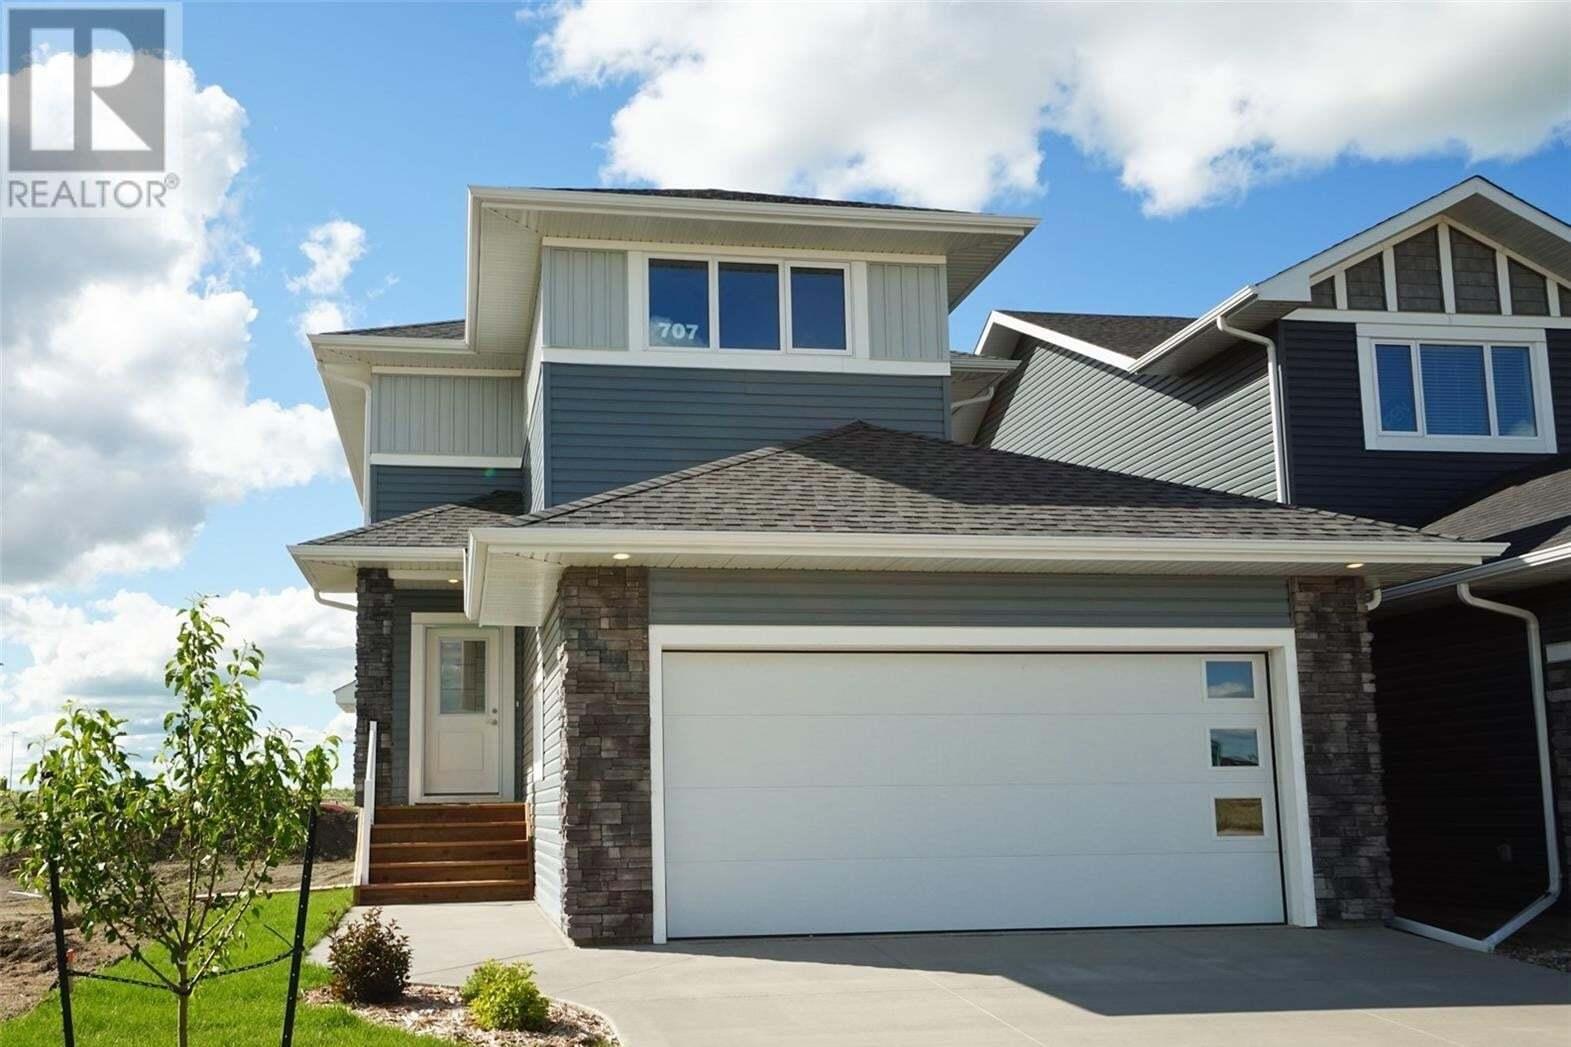 House for sale at 707 Mcfaull Ln Saskatoon Saskatchewan - MLS: SK817357